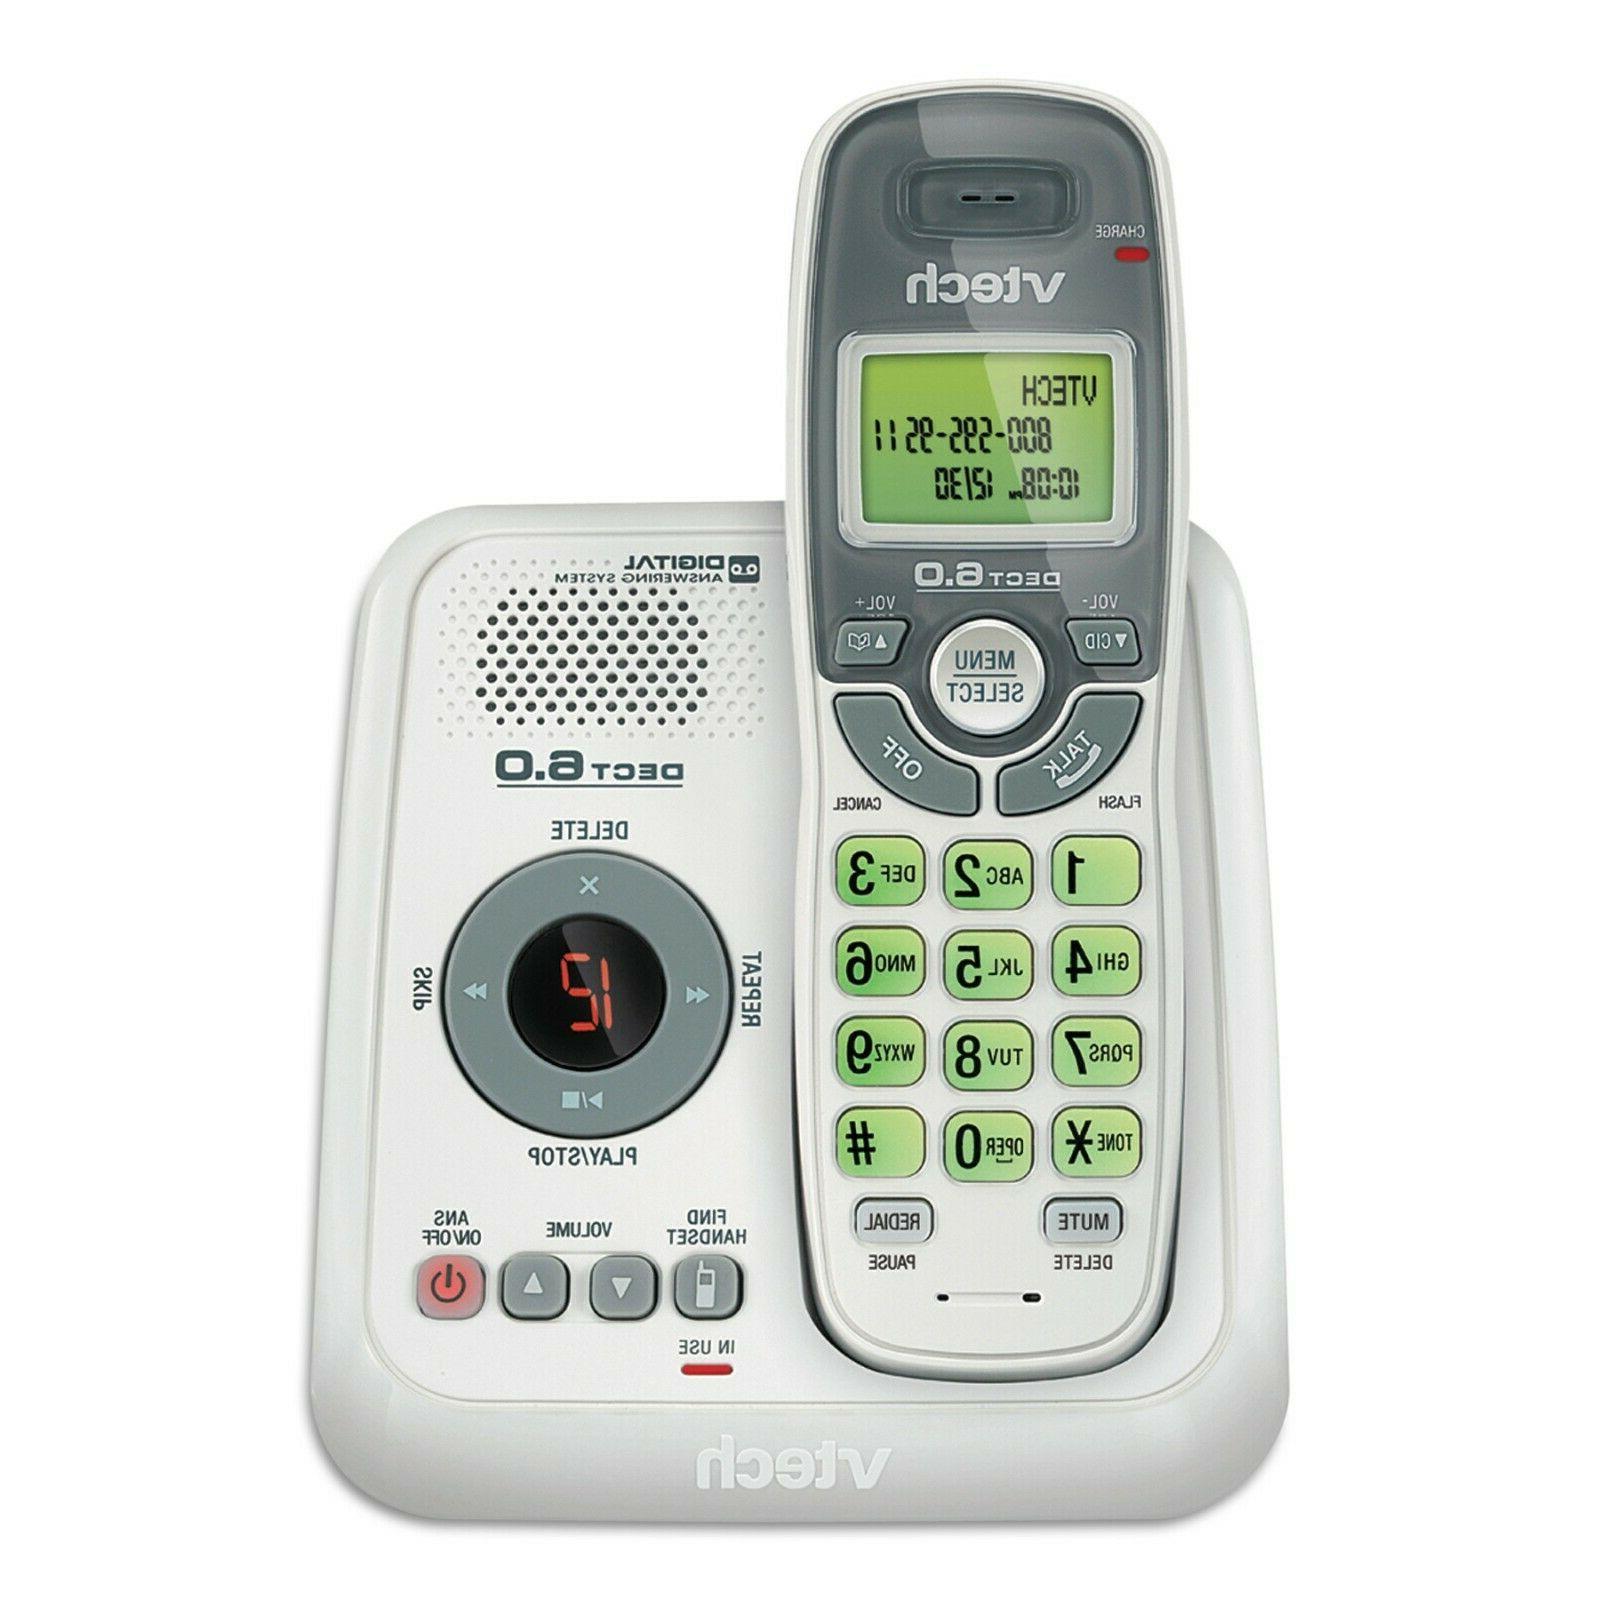 cs6124 dect 6 0 cordless phone